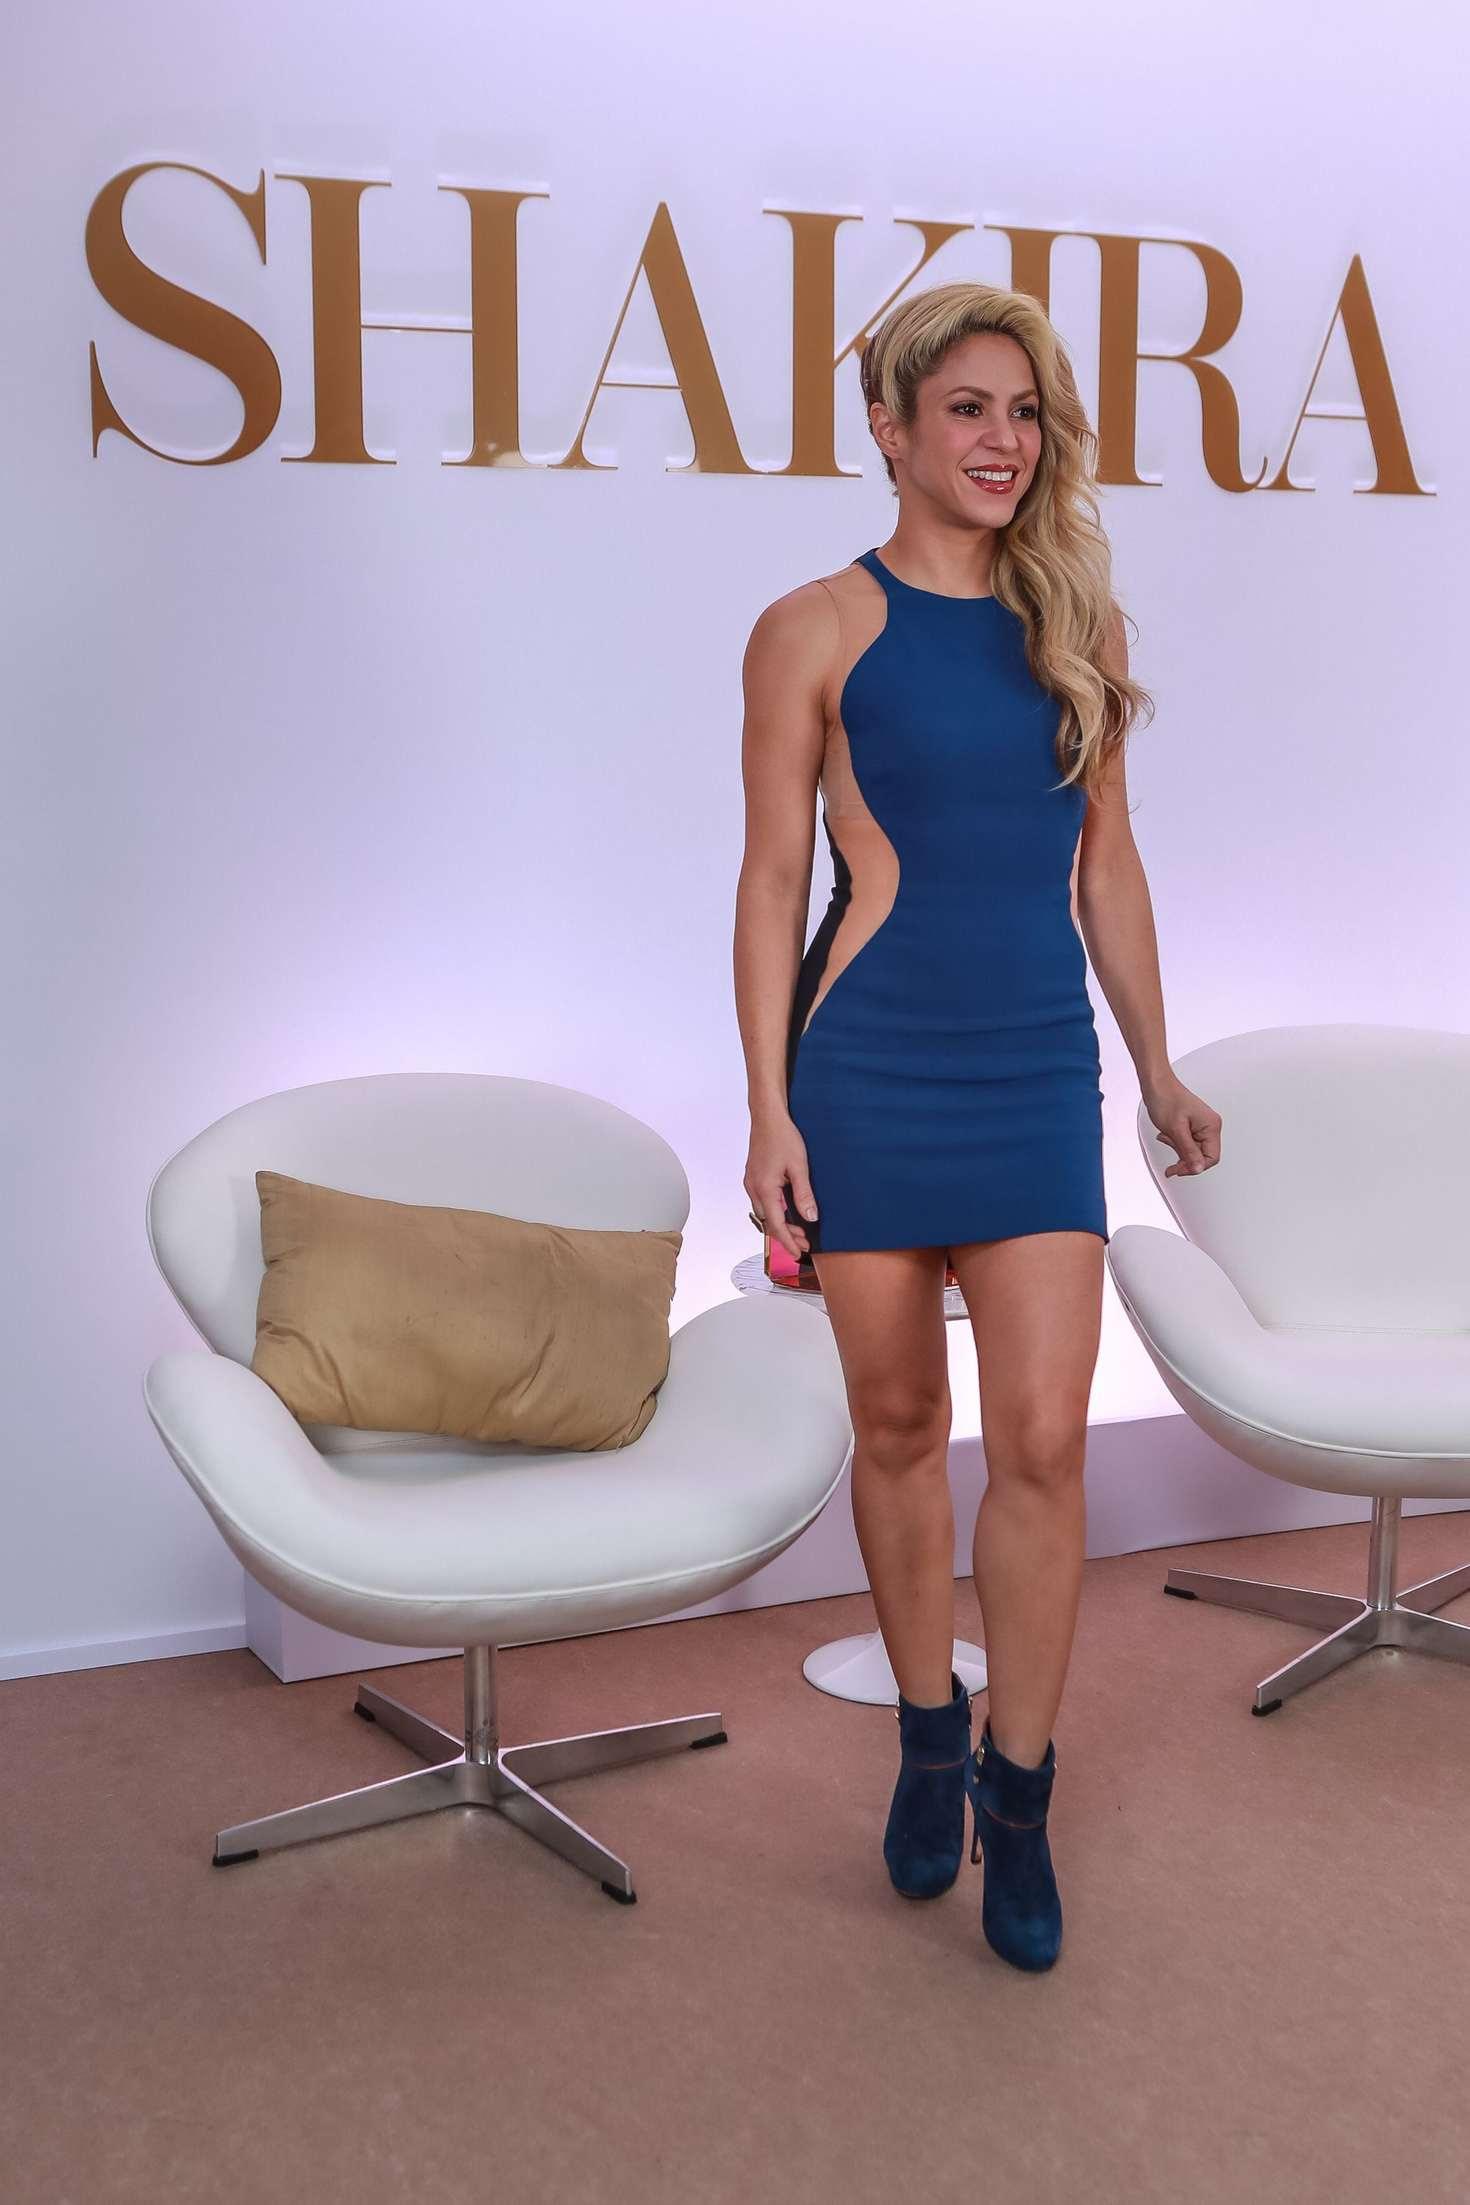 Shakira At Her New Fragrance Line Dance In Sao Paulo  Indian Girls Villa -9927